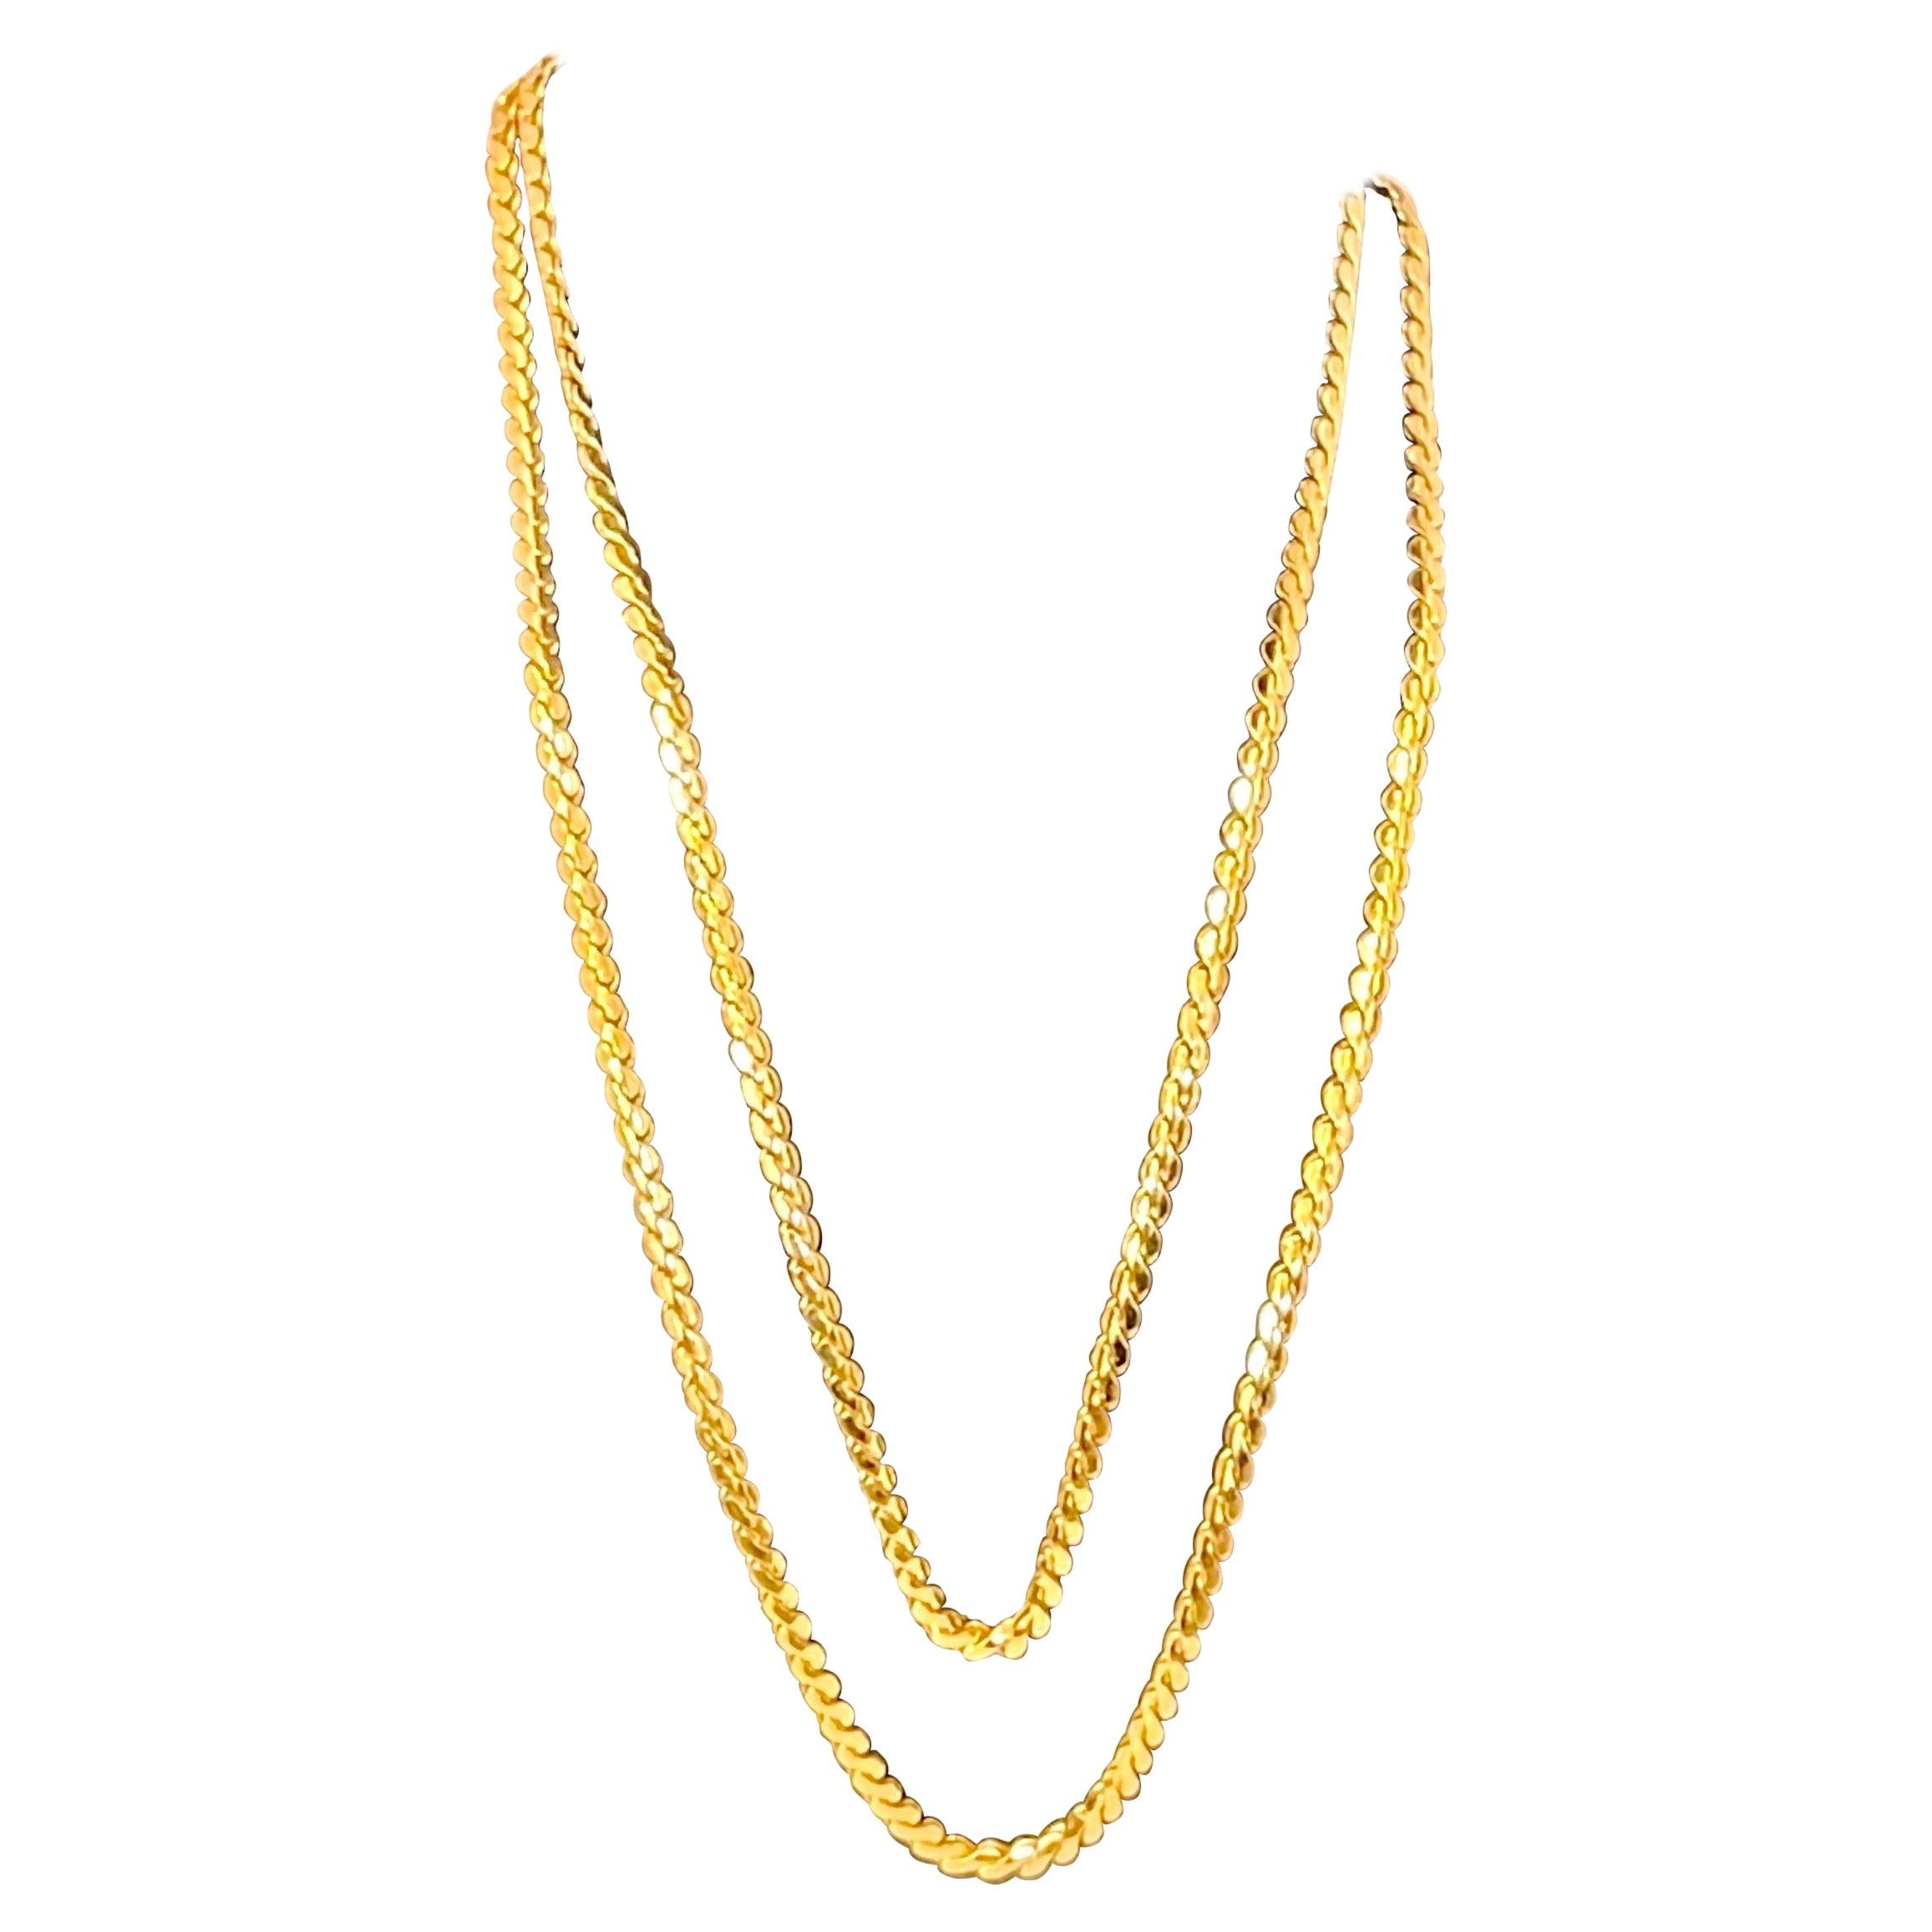 Vintage 18 Karat Yellow Gold 19 Gm Chain Necklace